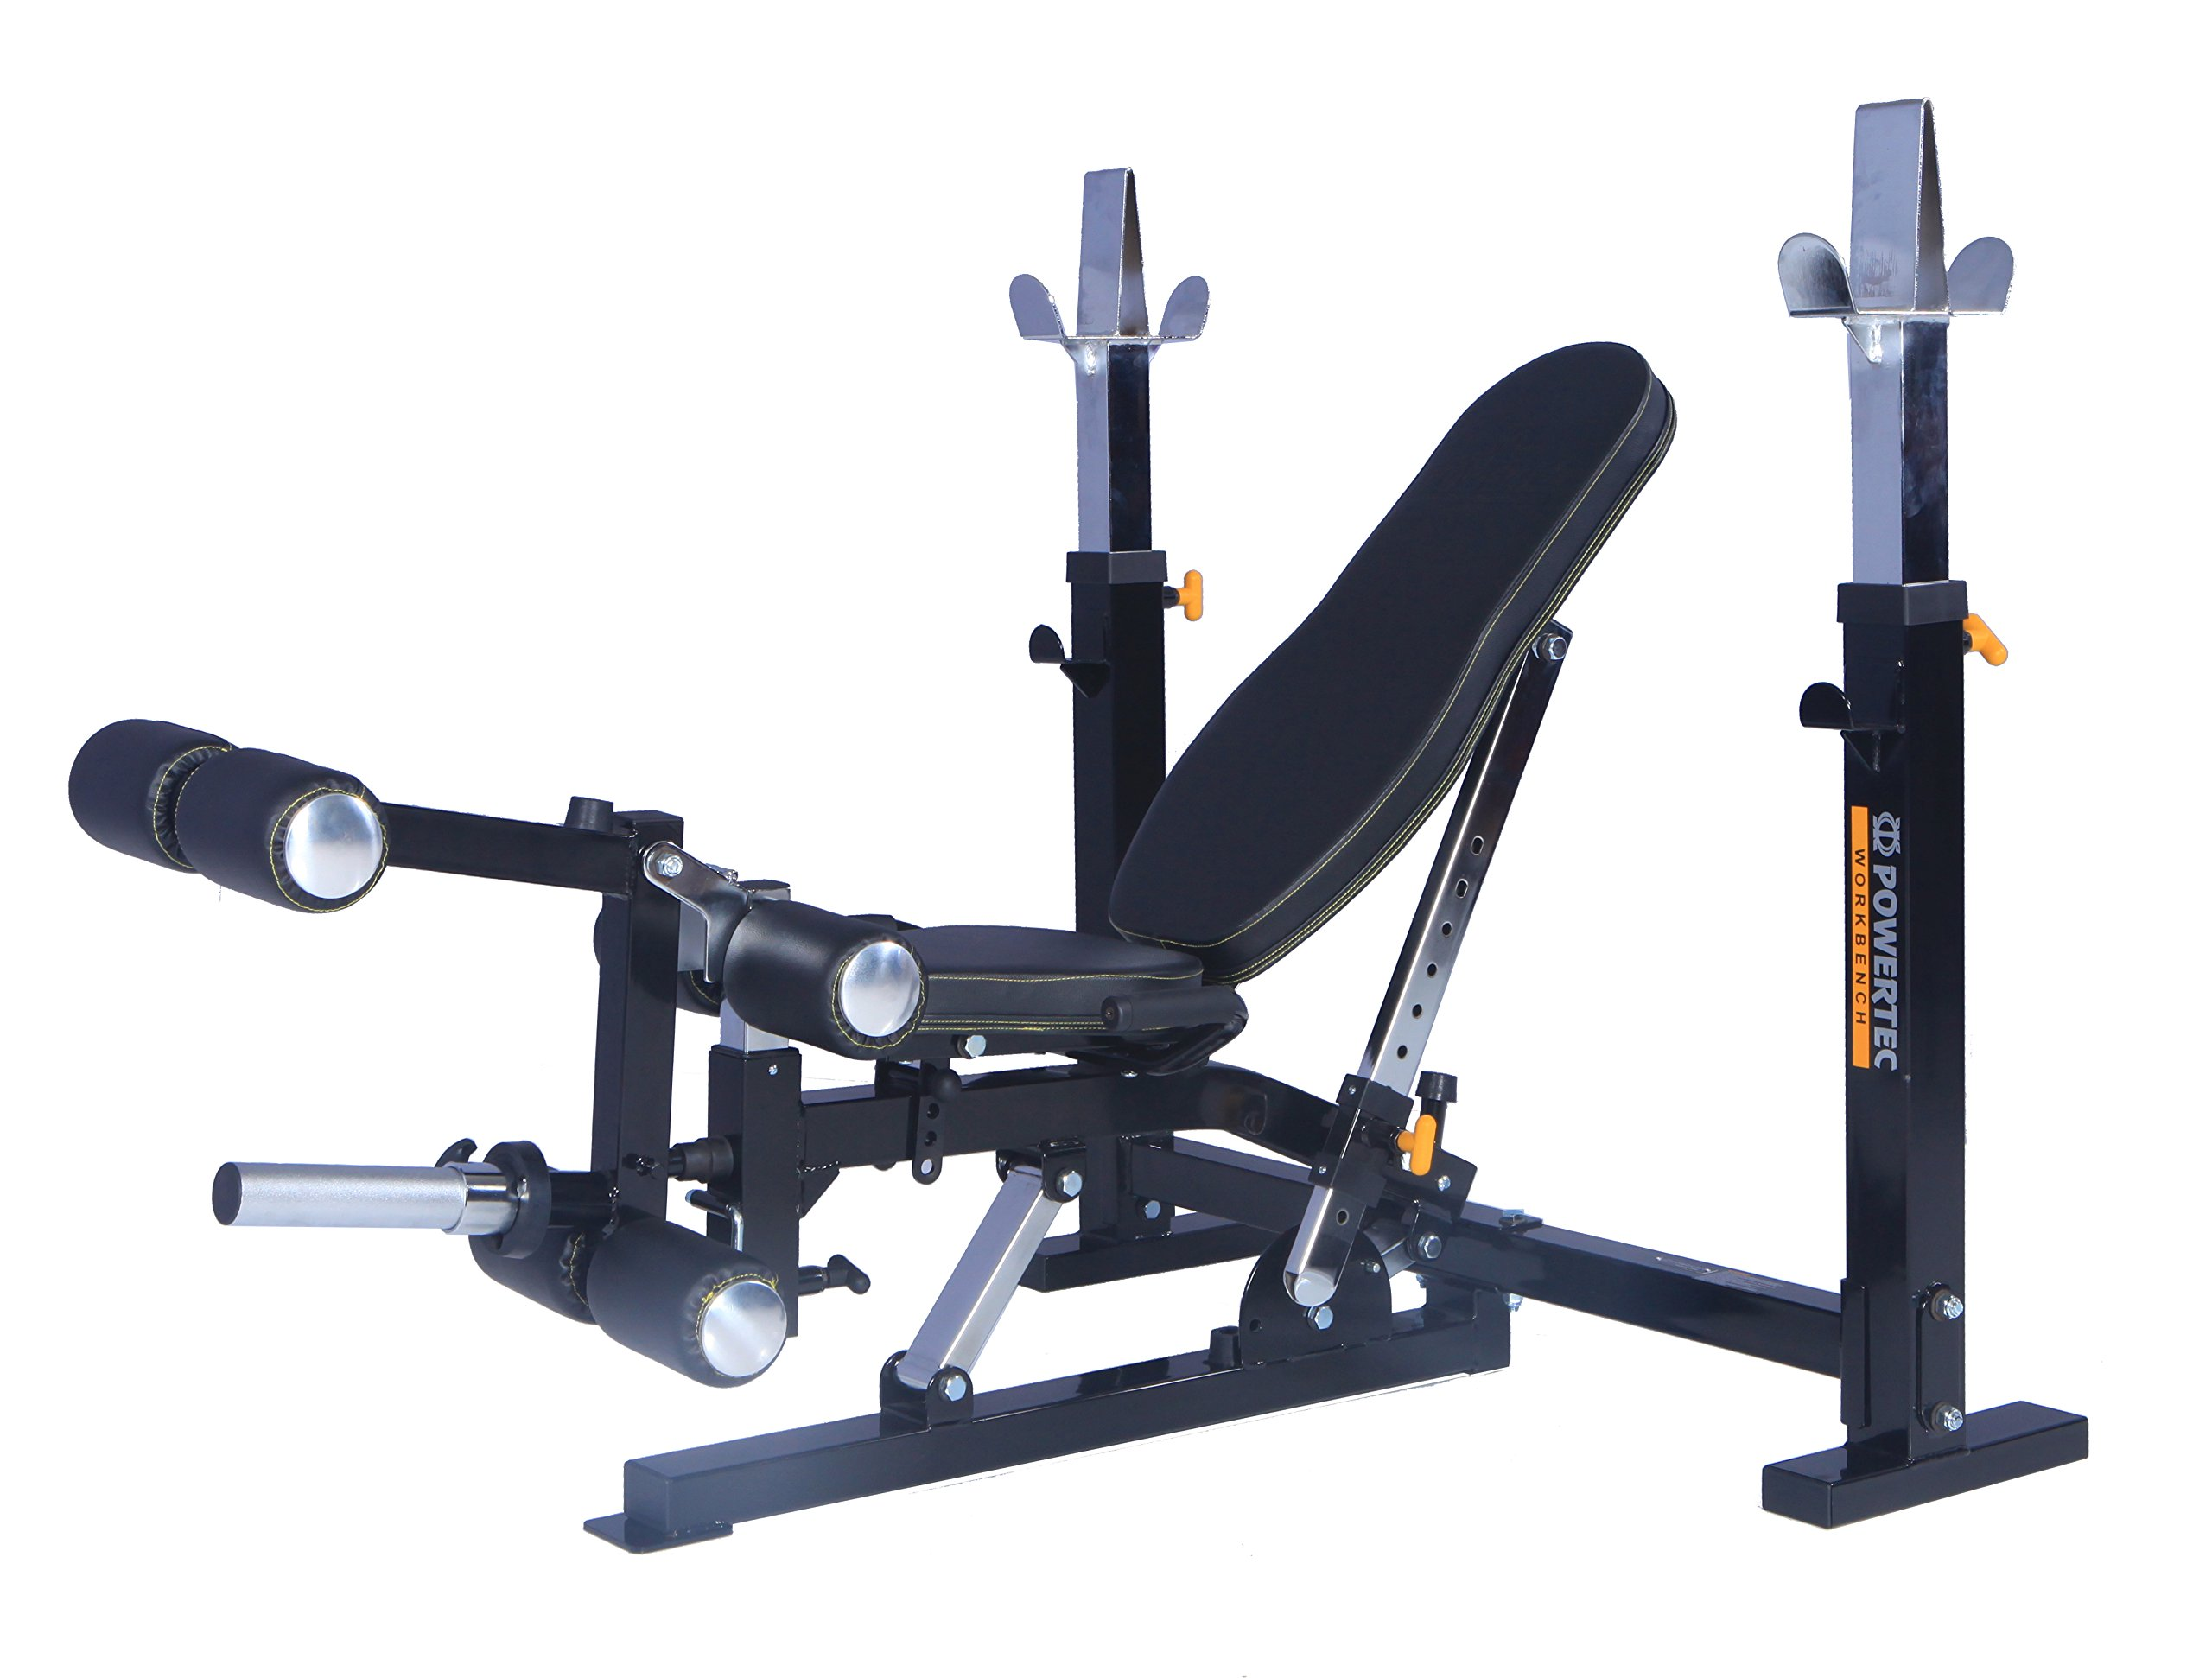 Powertec Workbench Olympic Bench (WB-OB15) + Leg Lift Accessory (WB-LLA16)